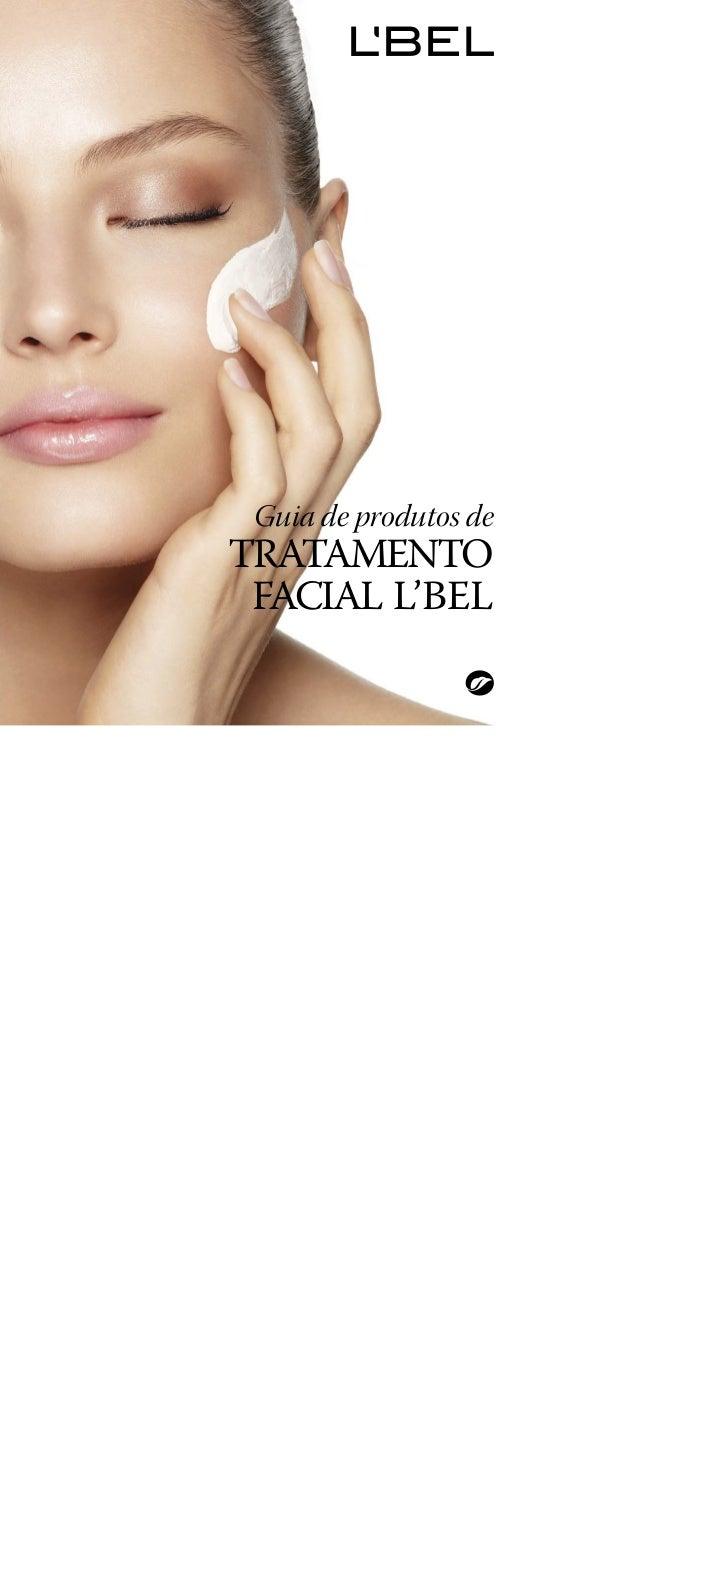 Guia de produtos deTRATAMENTO FACIAL L'BEL